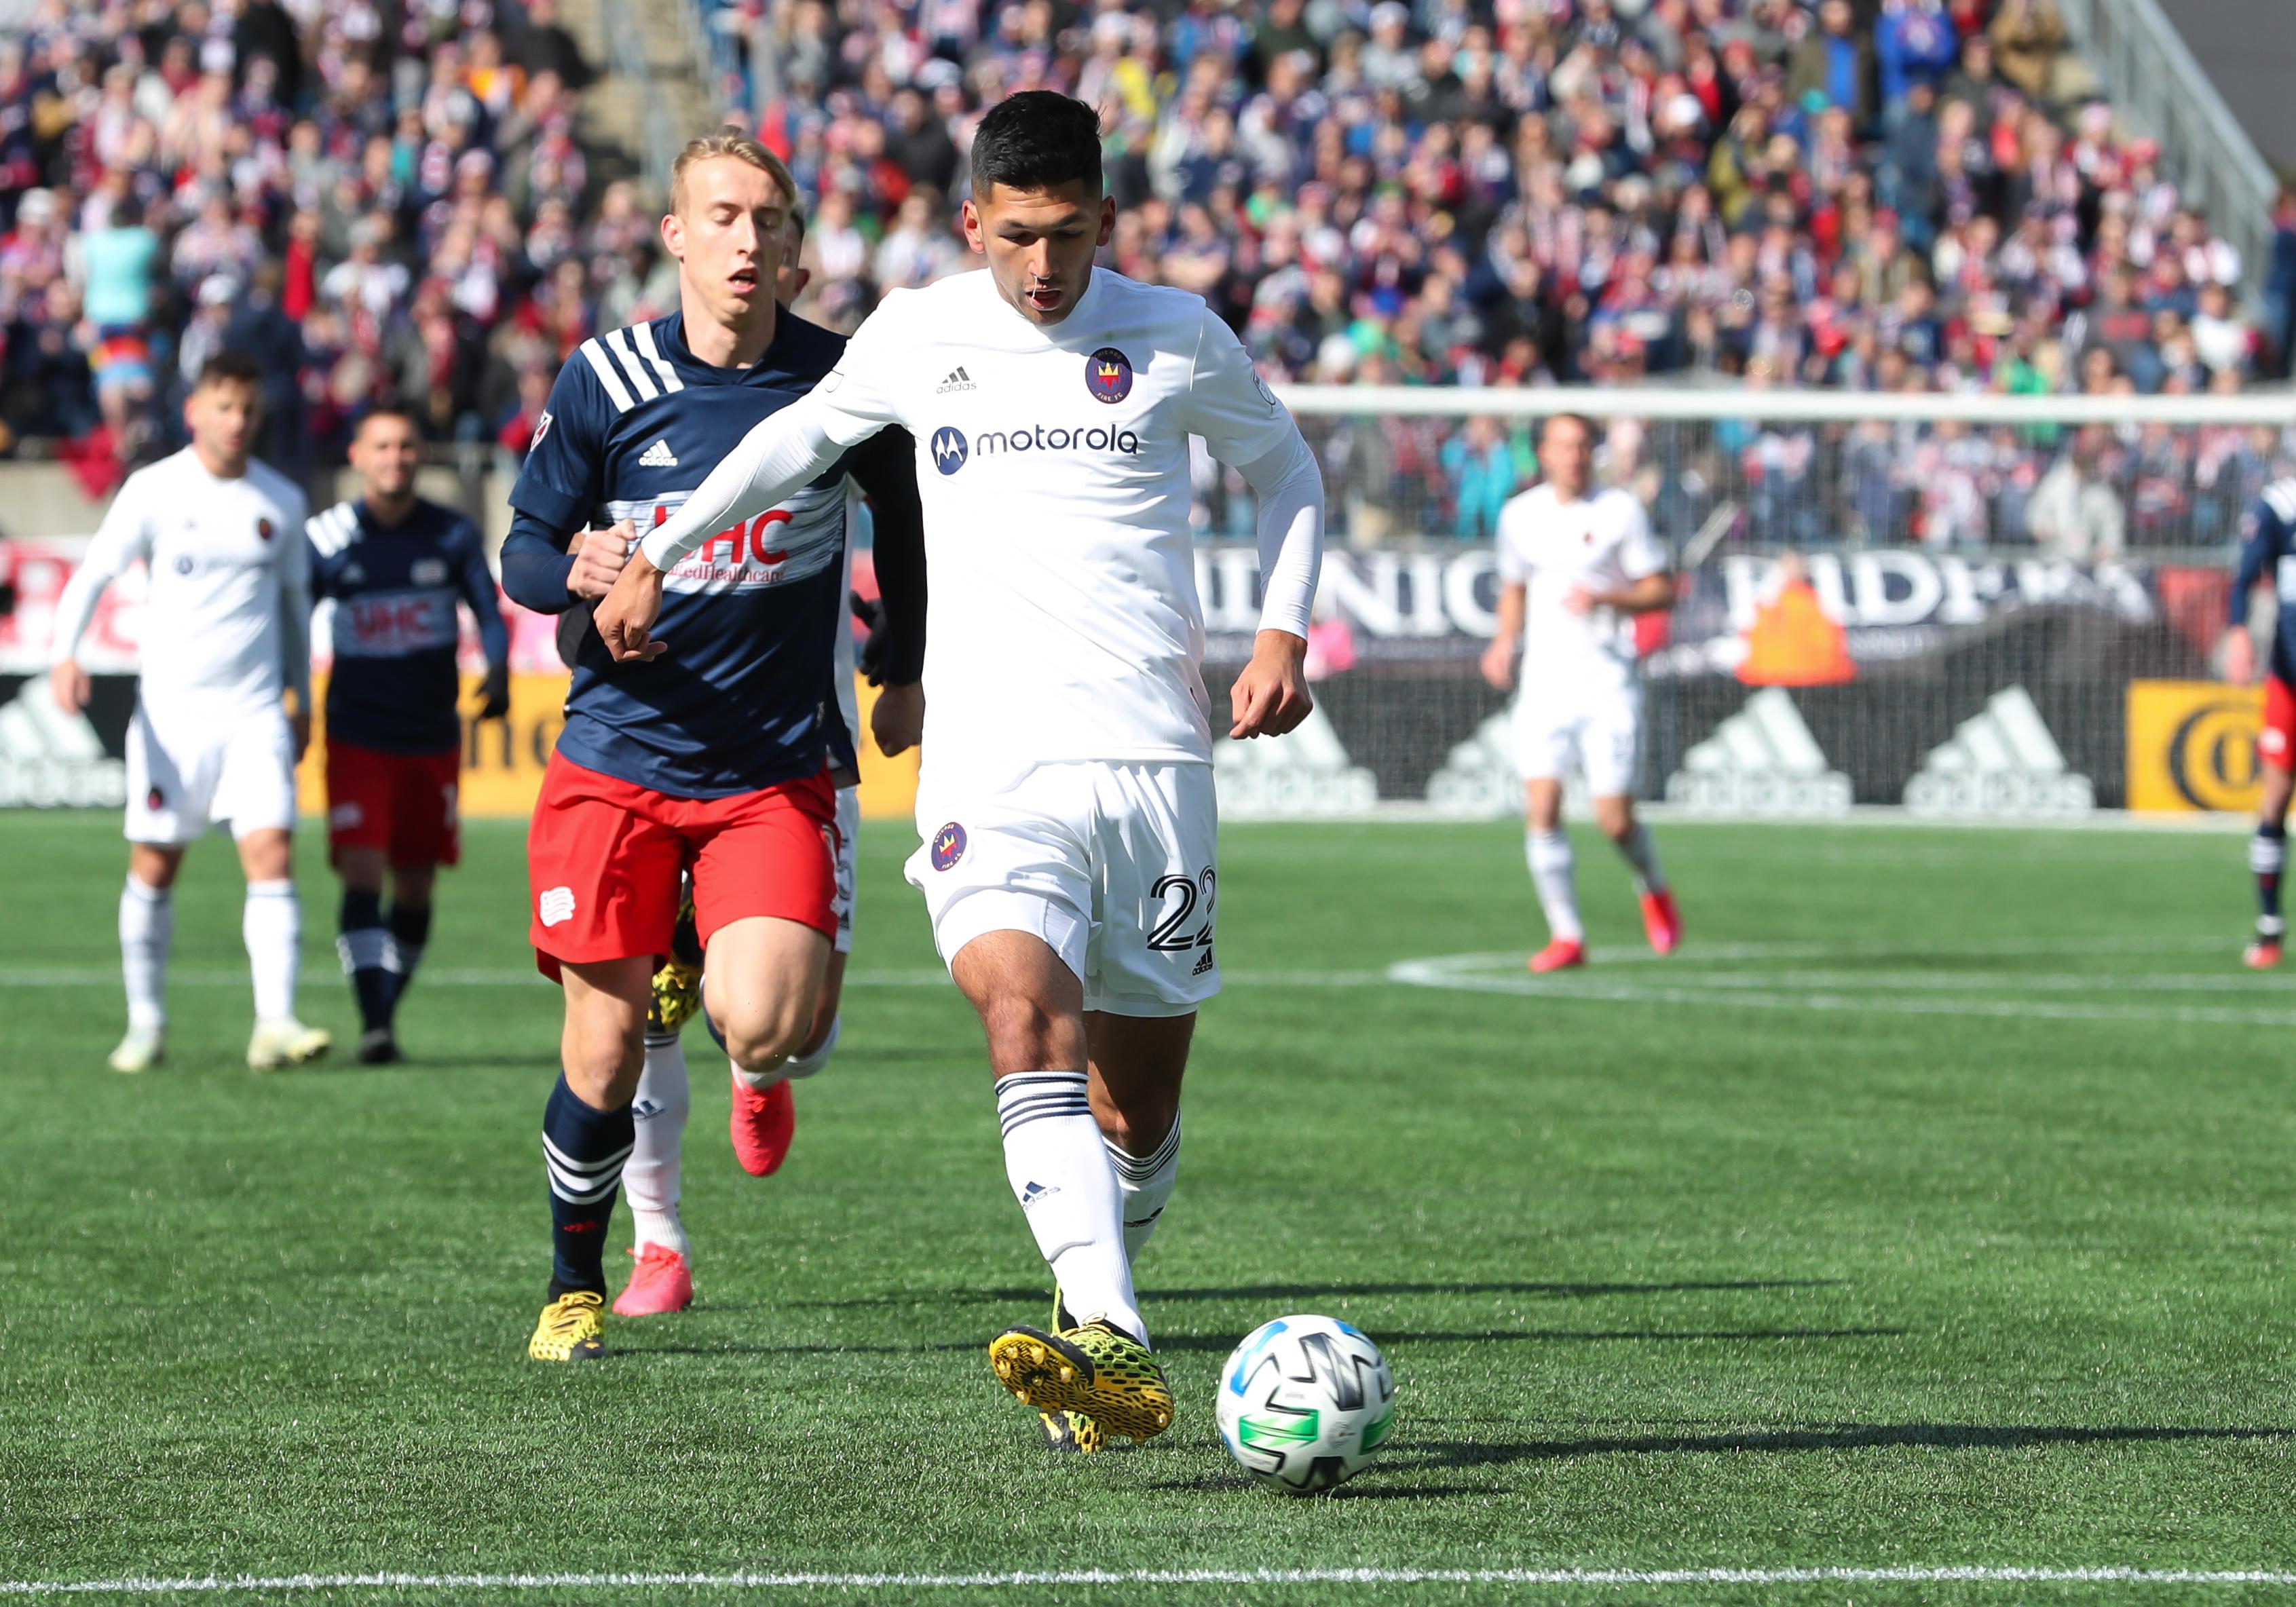 SOCCER: MAR 07 MLS - New England Revolution v Chicago Fire